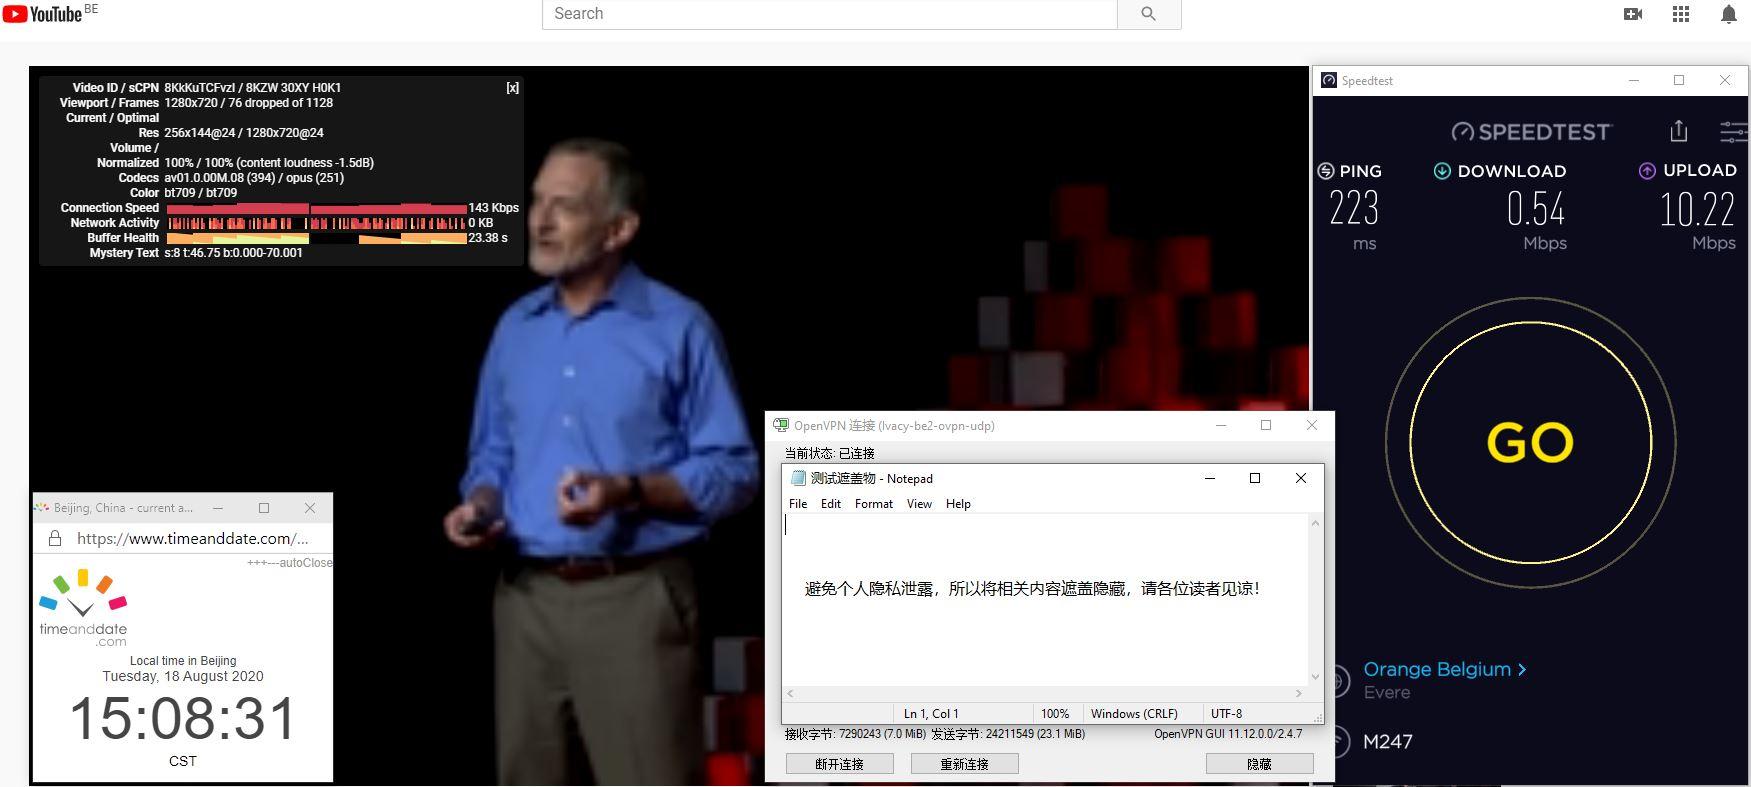 Windows10 IvacyVPN OpenVPN Be2 中国VPN 翻墙 科学上网 翻墙速度测试 - 20200818